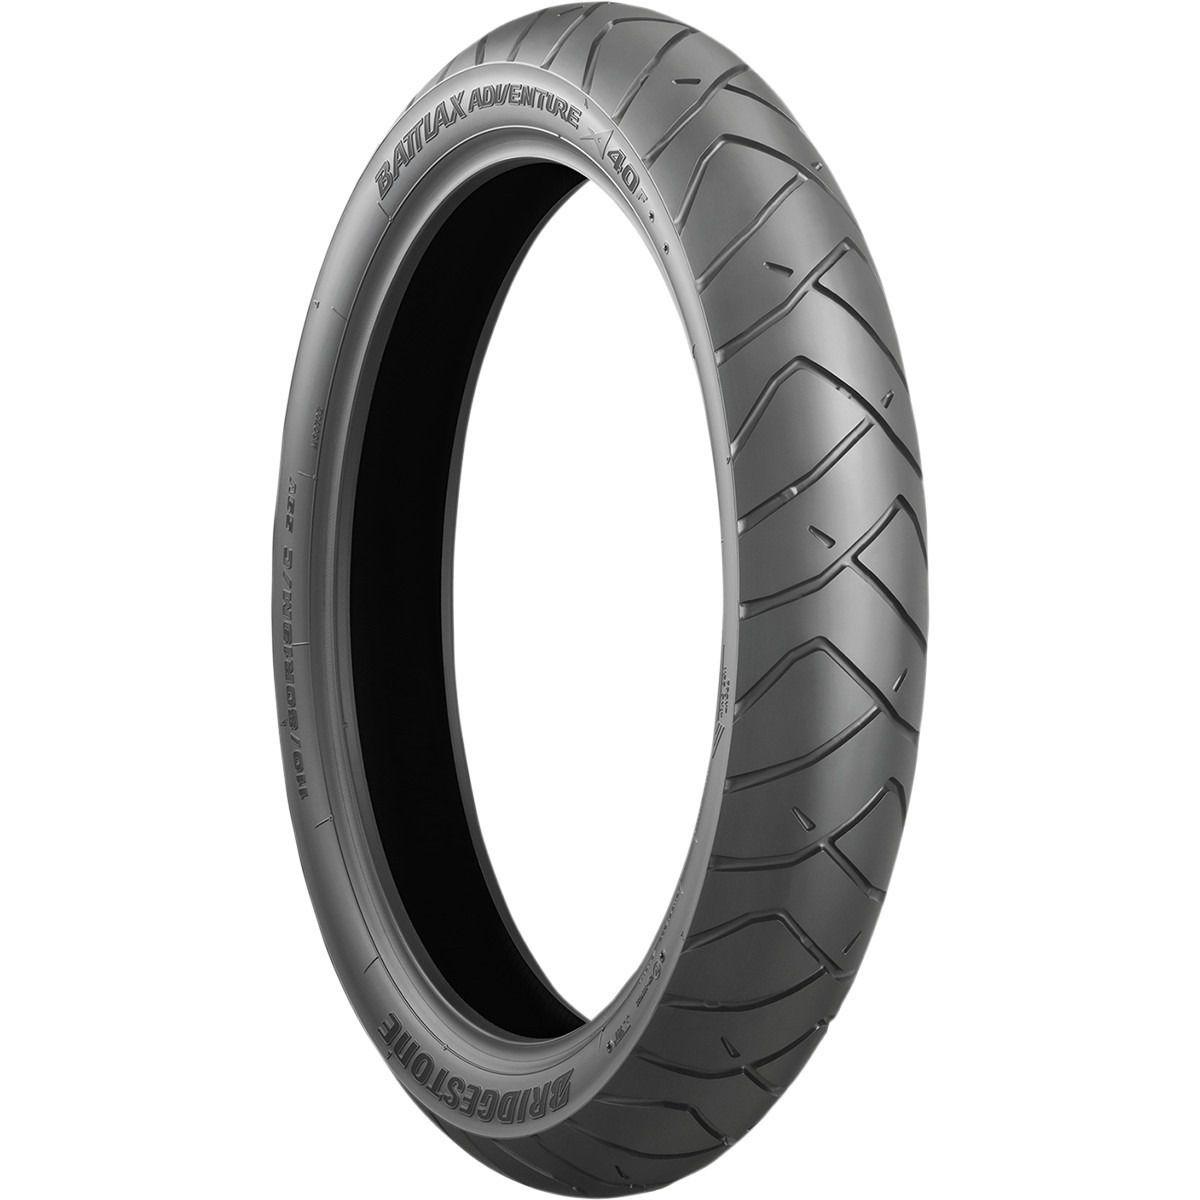 Pneus Bridgestone Battlax A40 120/70 R19 e 170/60 R17